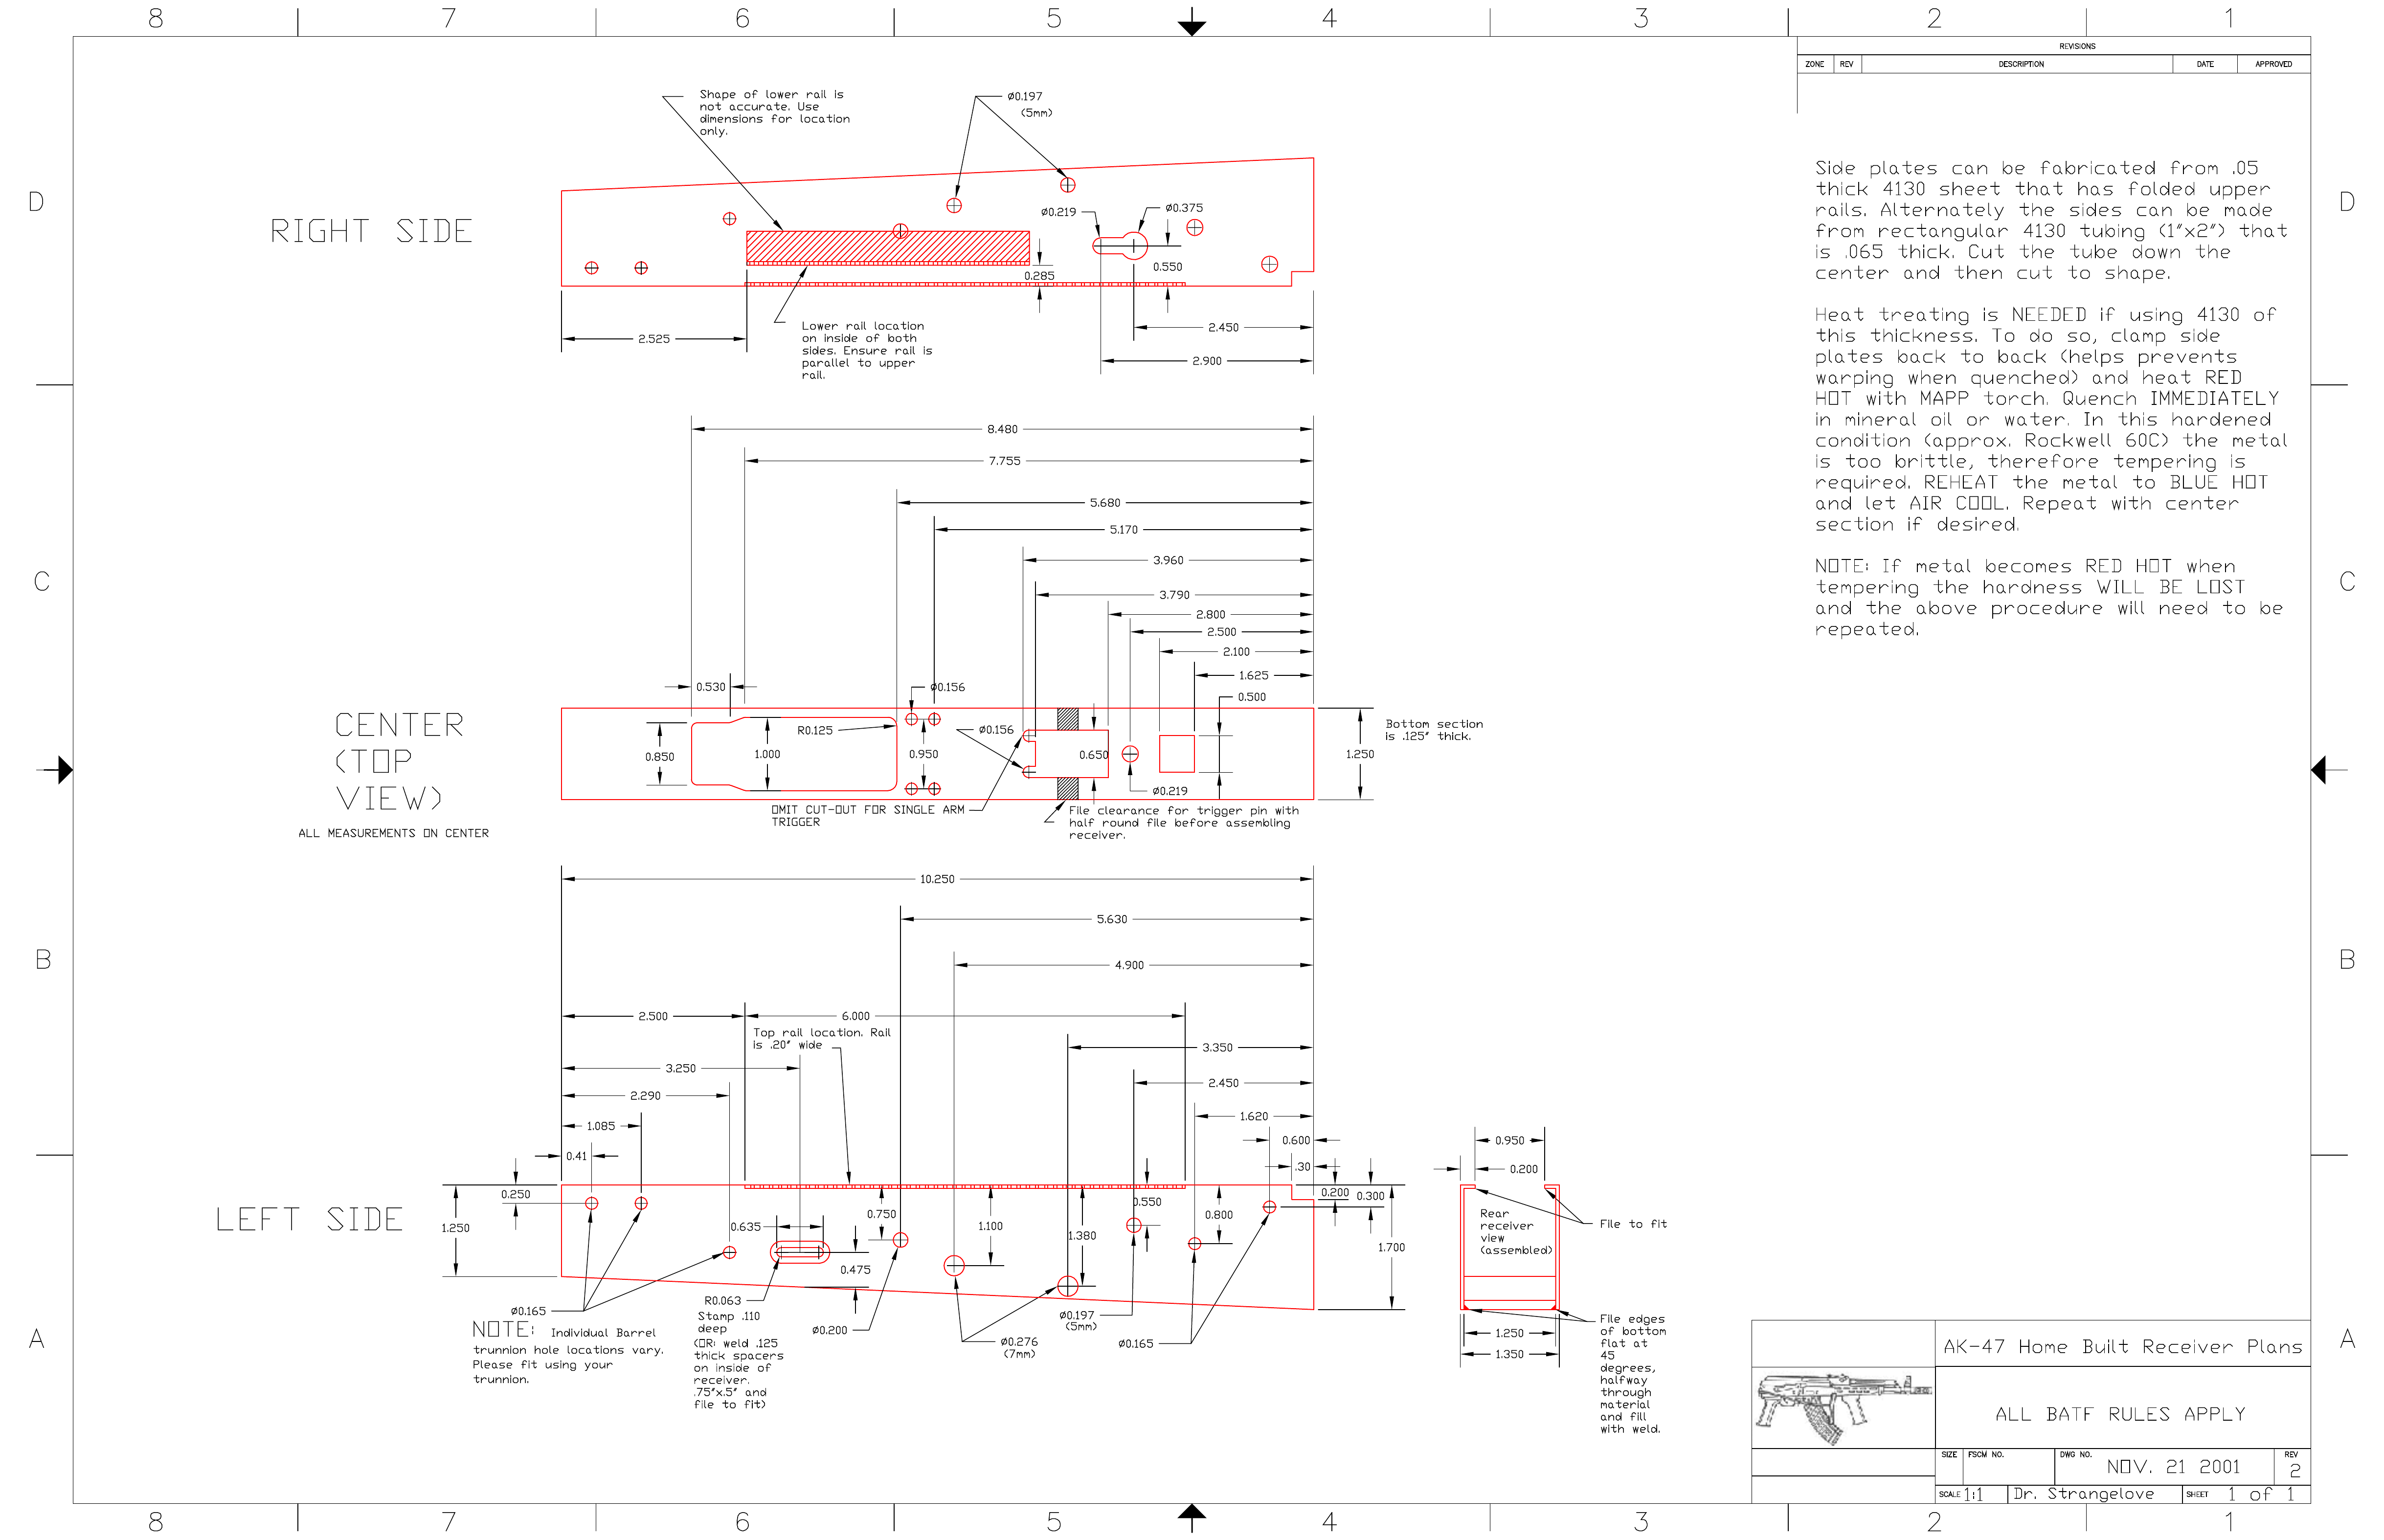 Ak 47 Receiver Diagram - Wiring Diagram Go